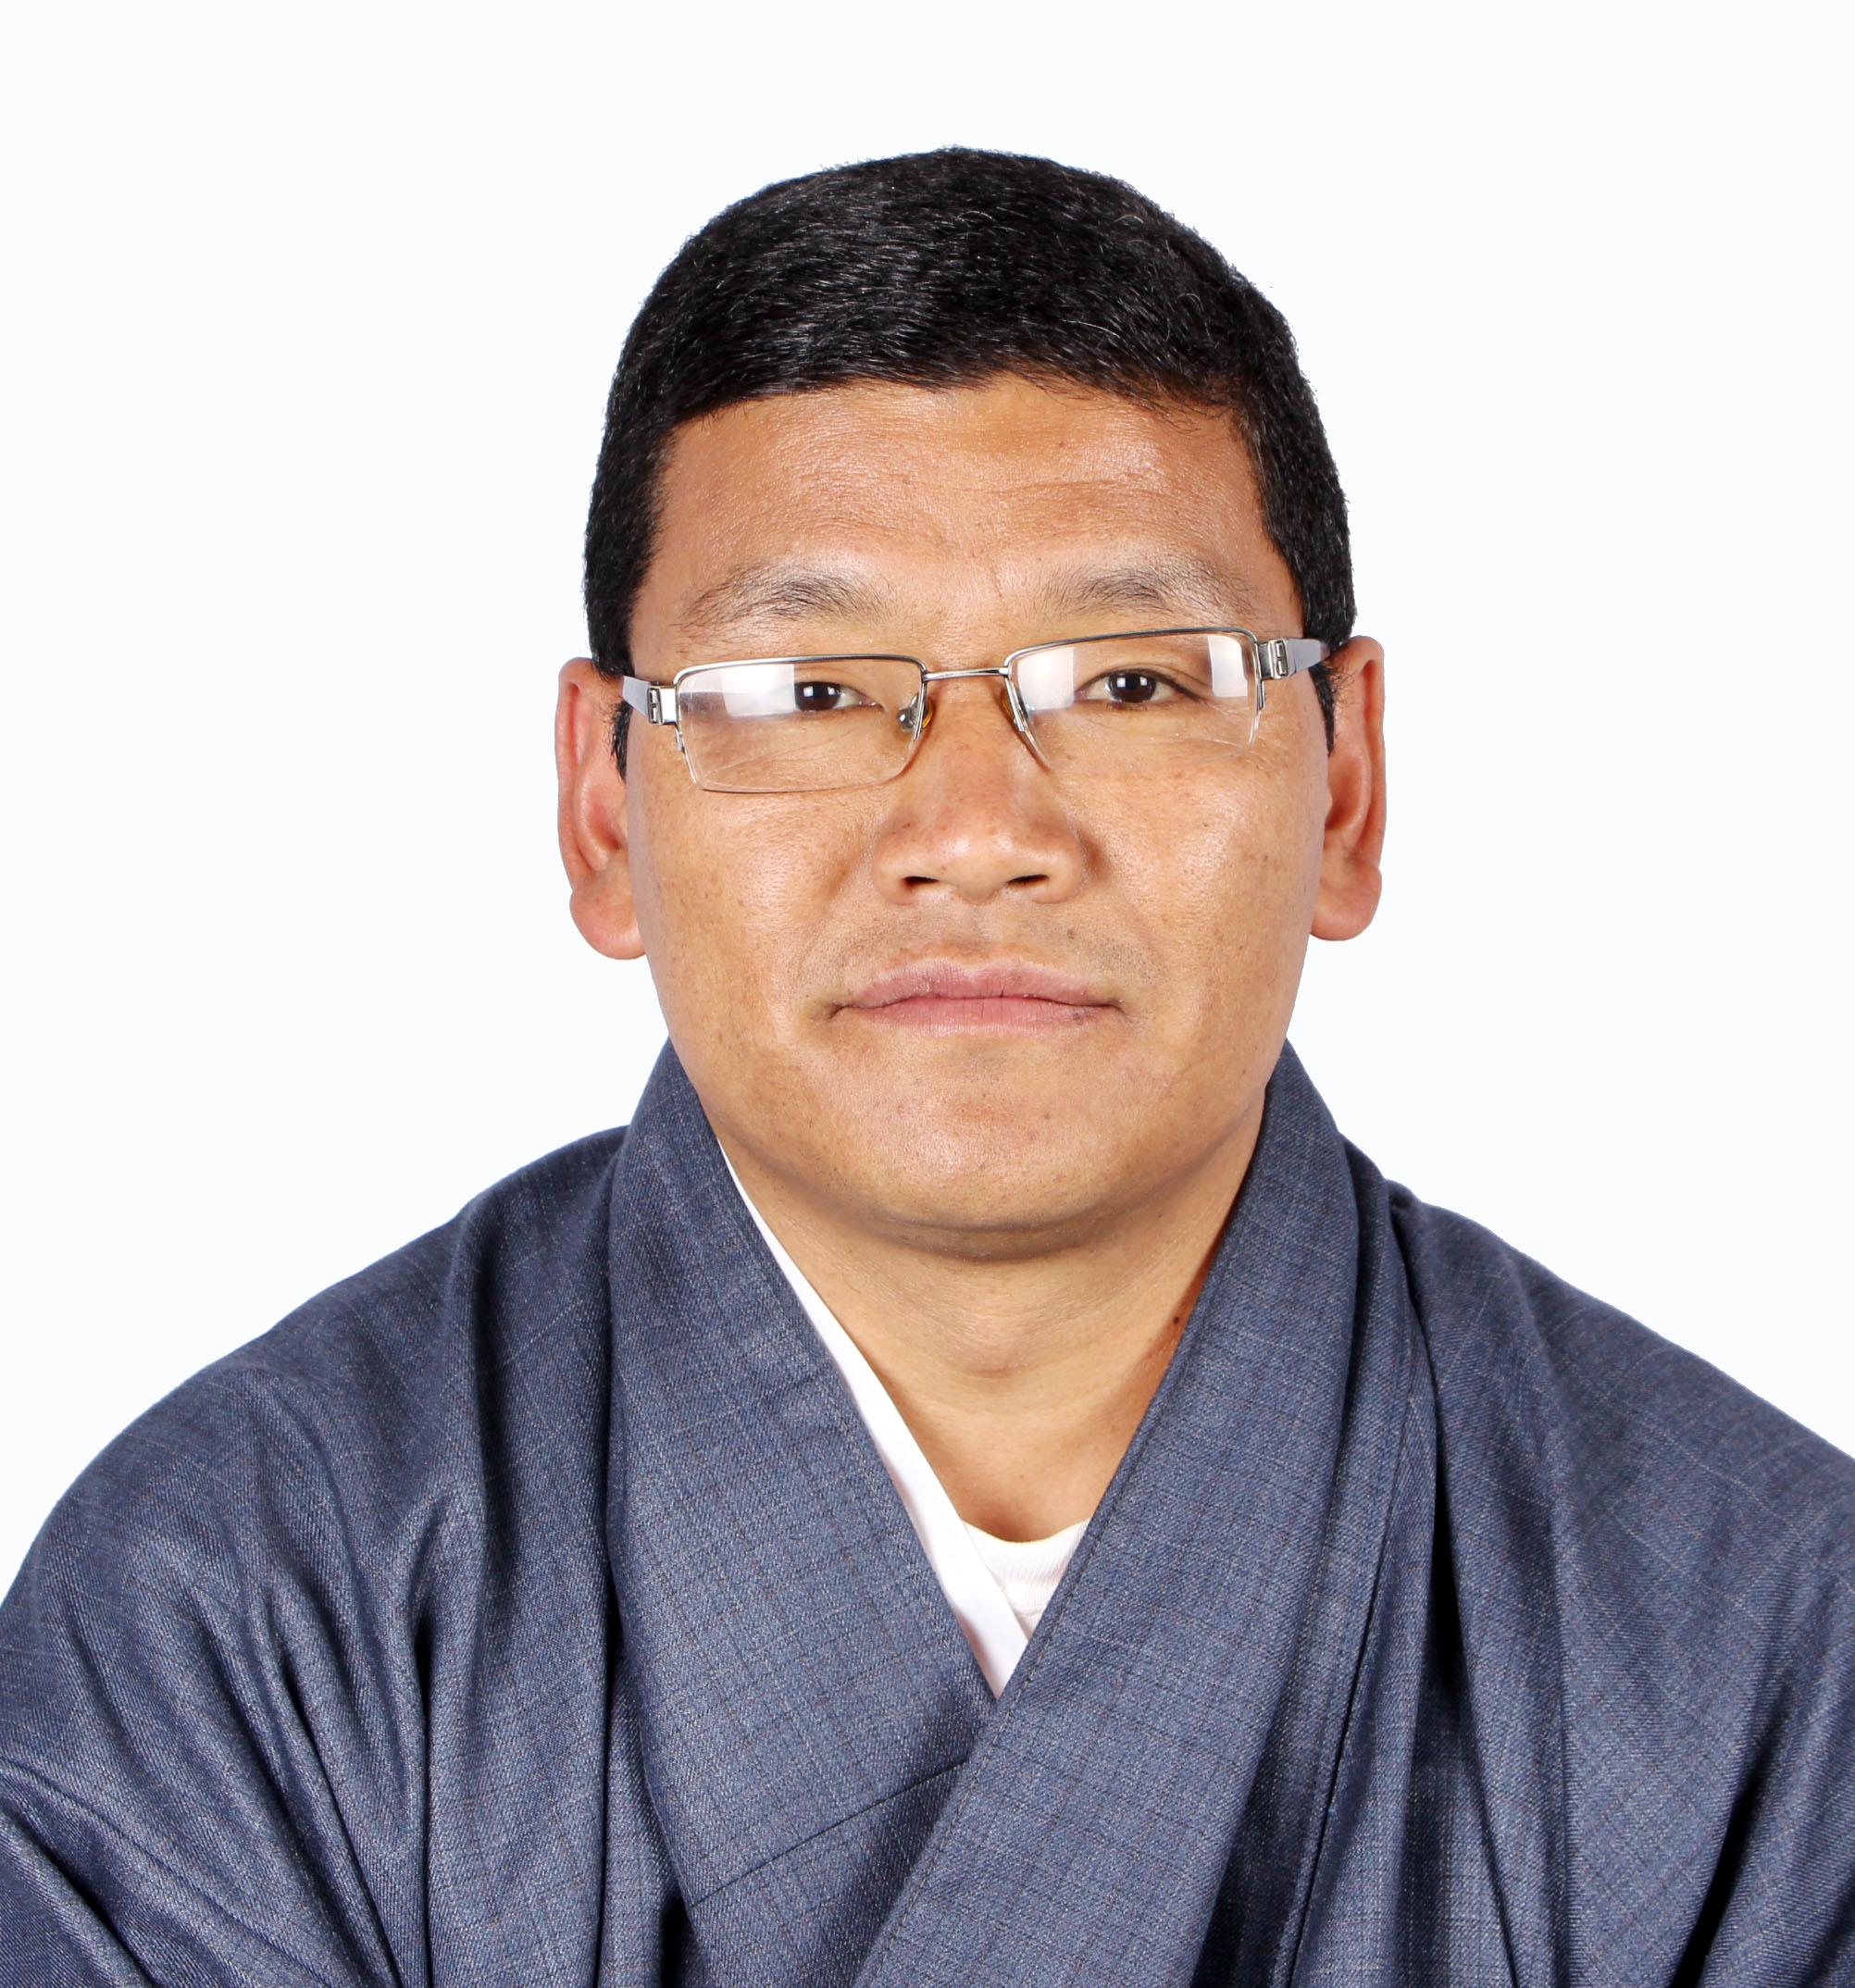 Mr. Ngawang Chophel